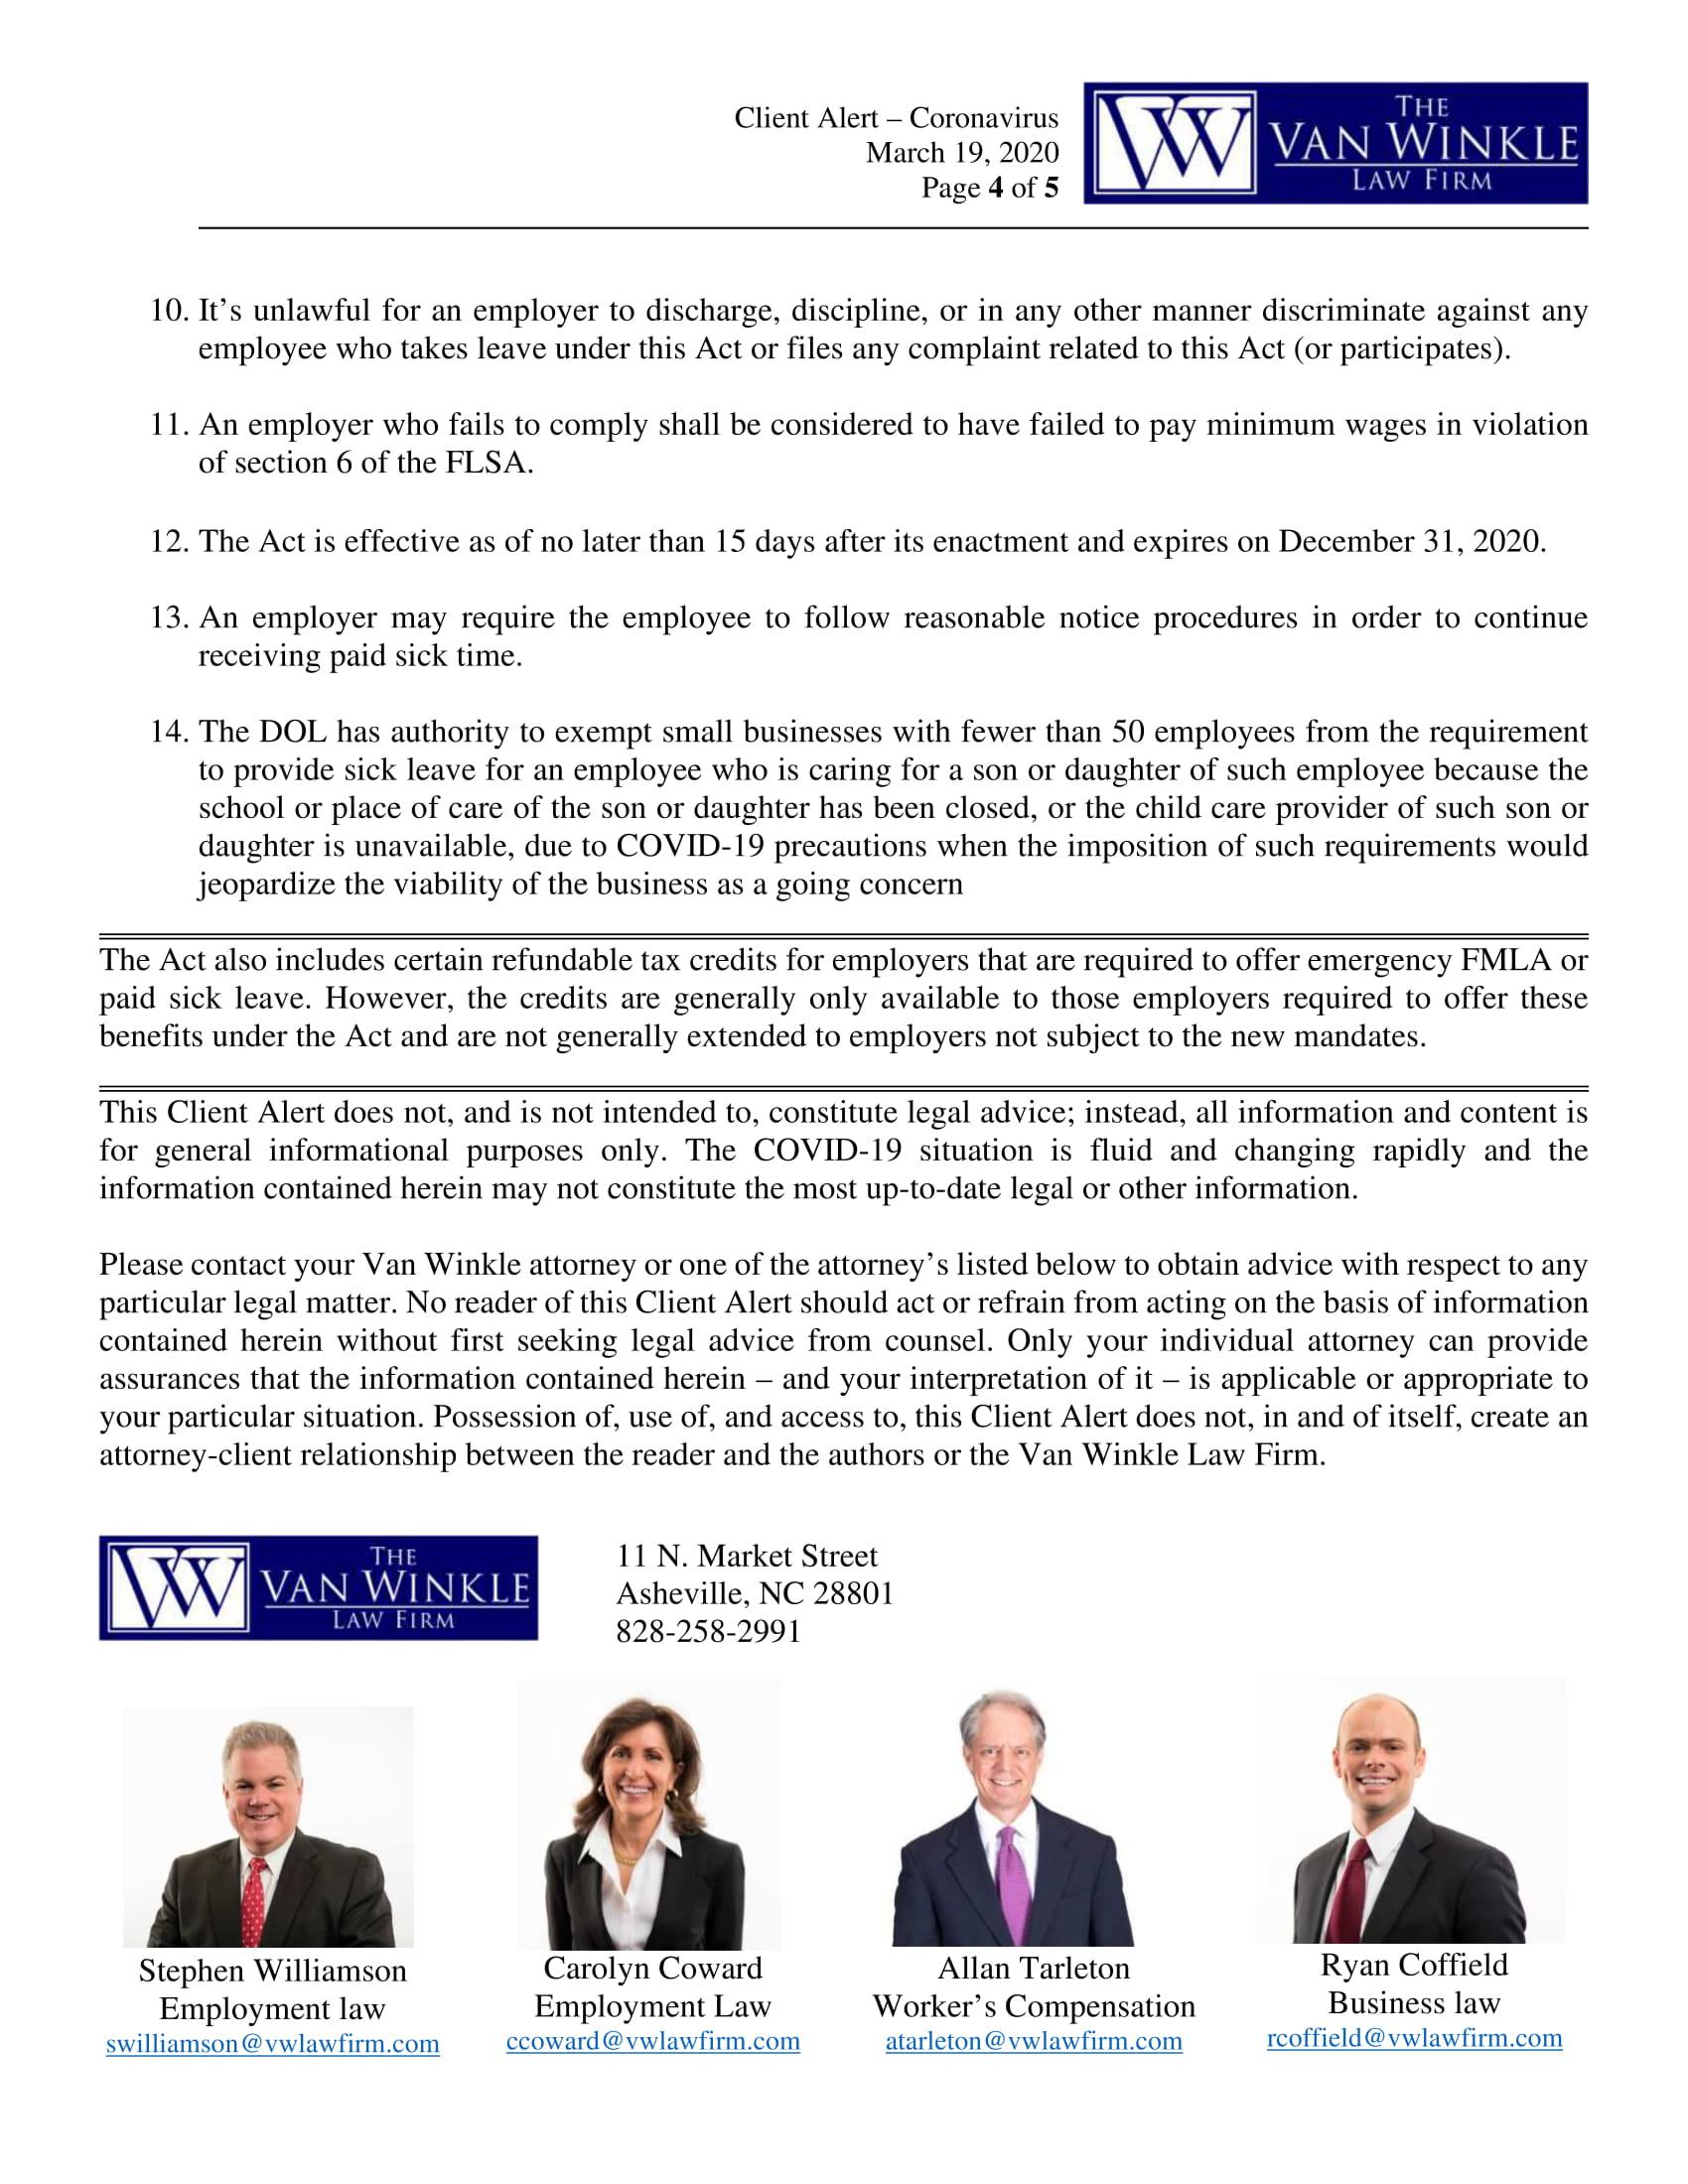 Families First Coronavirus Response Act Page 4